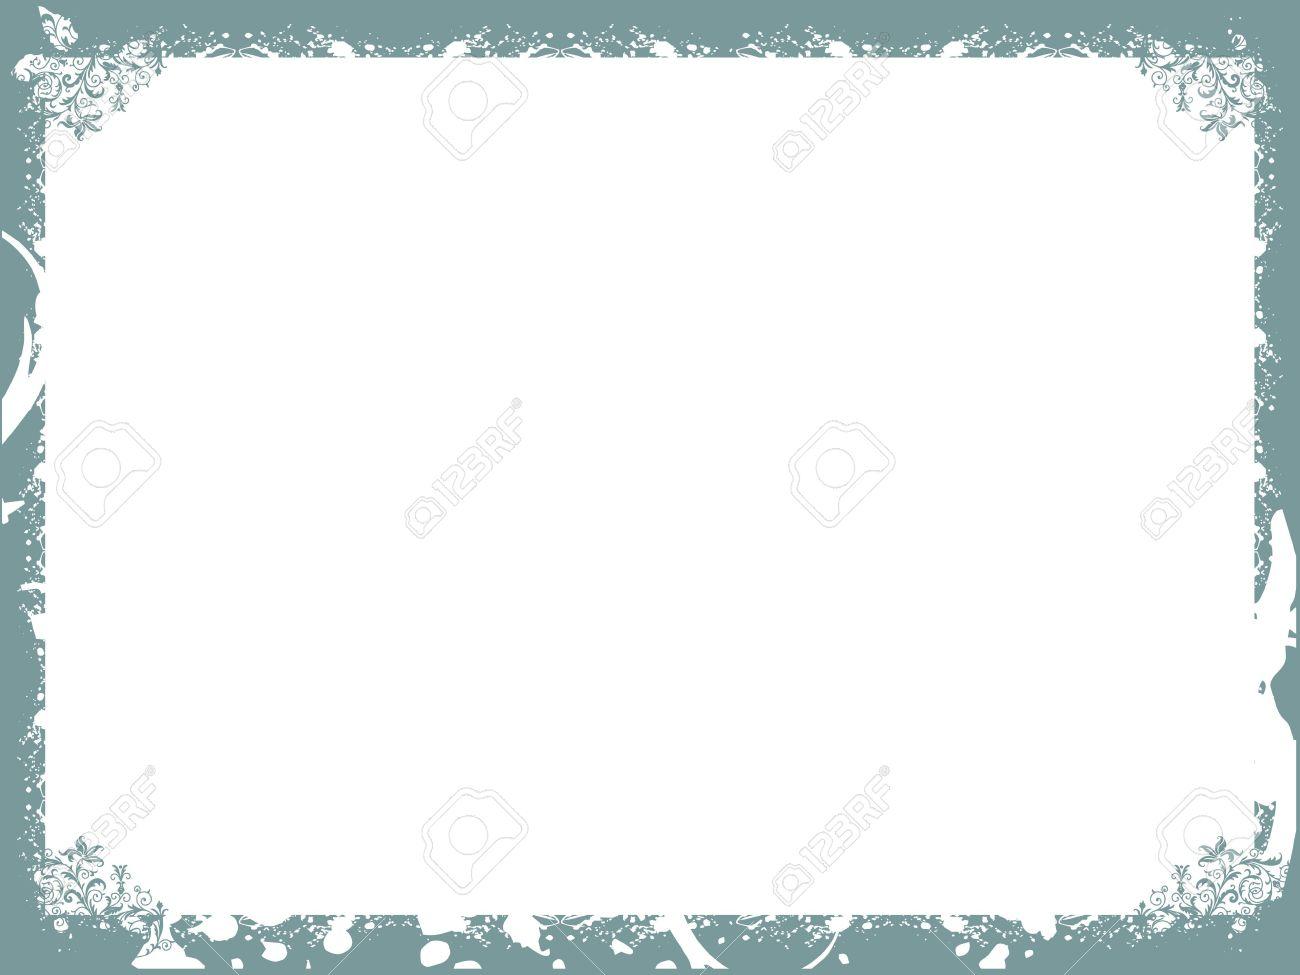 Floral Dark Cyan Border Background Frame, Wallpaper Stock Photo ...